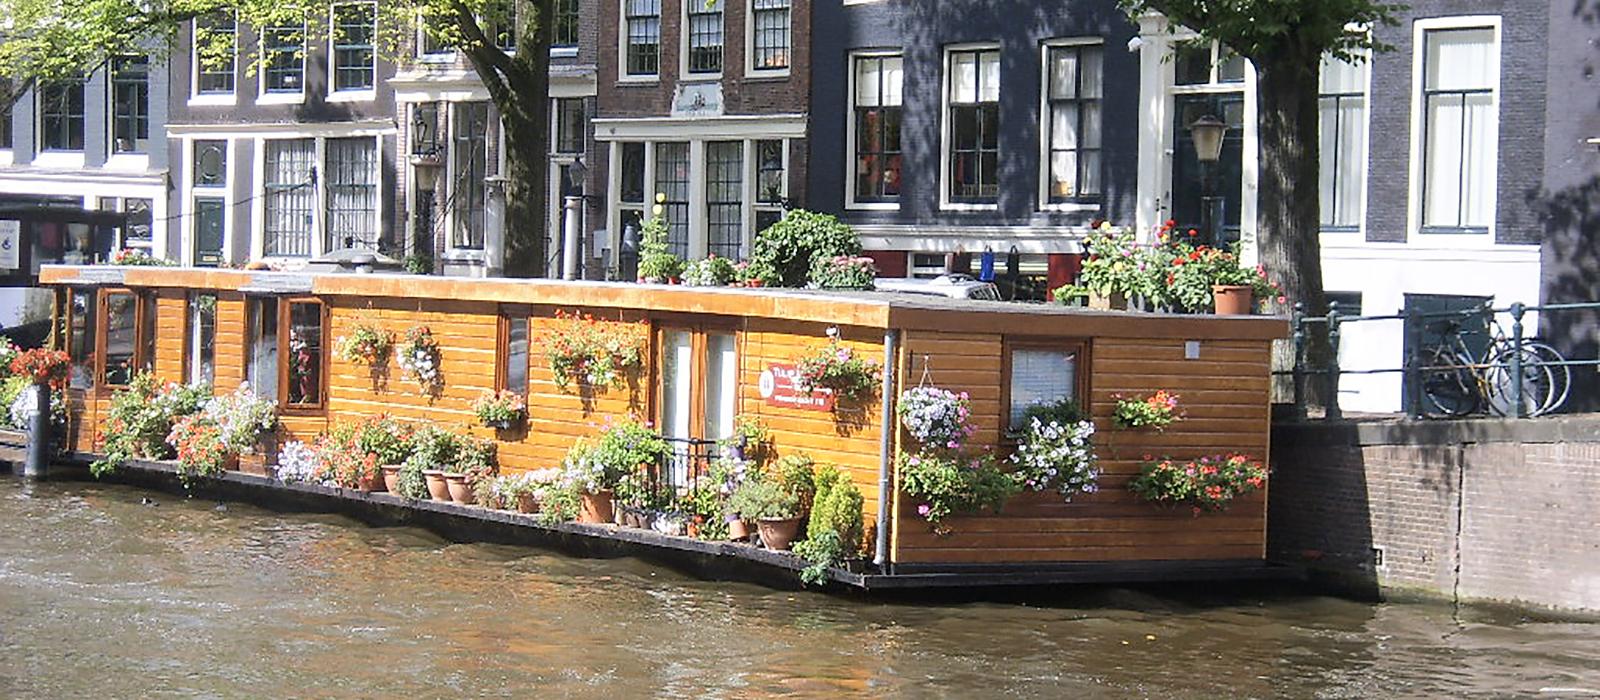 Amsterdam_SPA50572